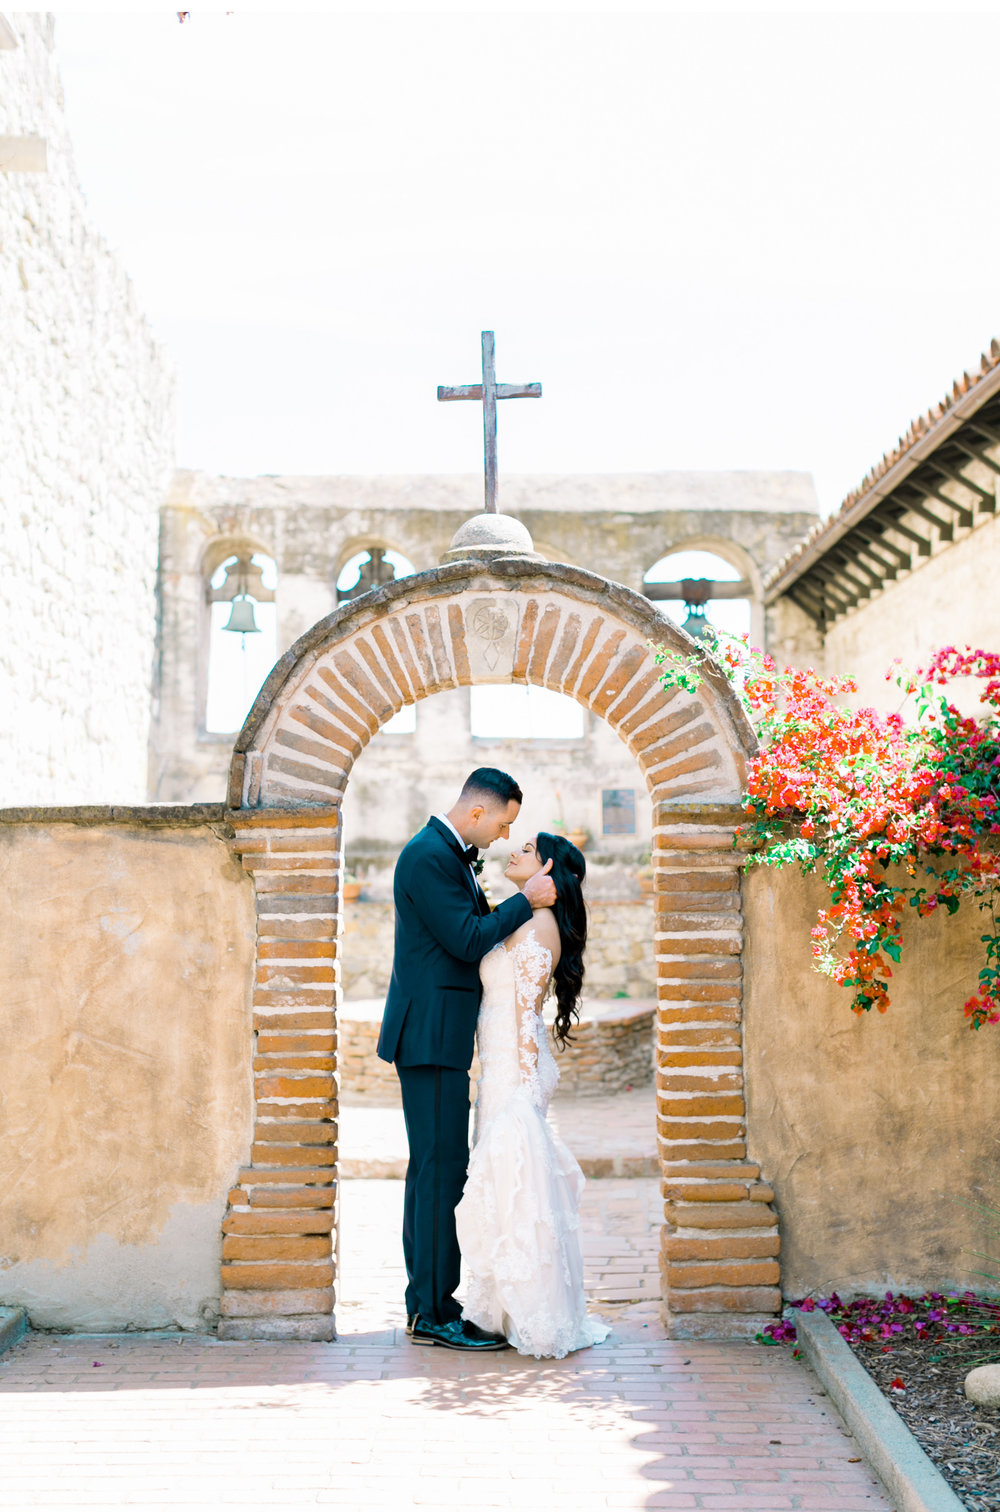 Malibu-Weddings-Natalie-Schutt-Photography_01.jpg